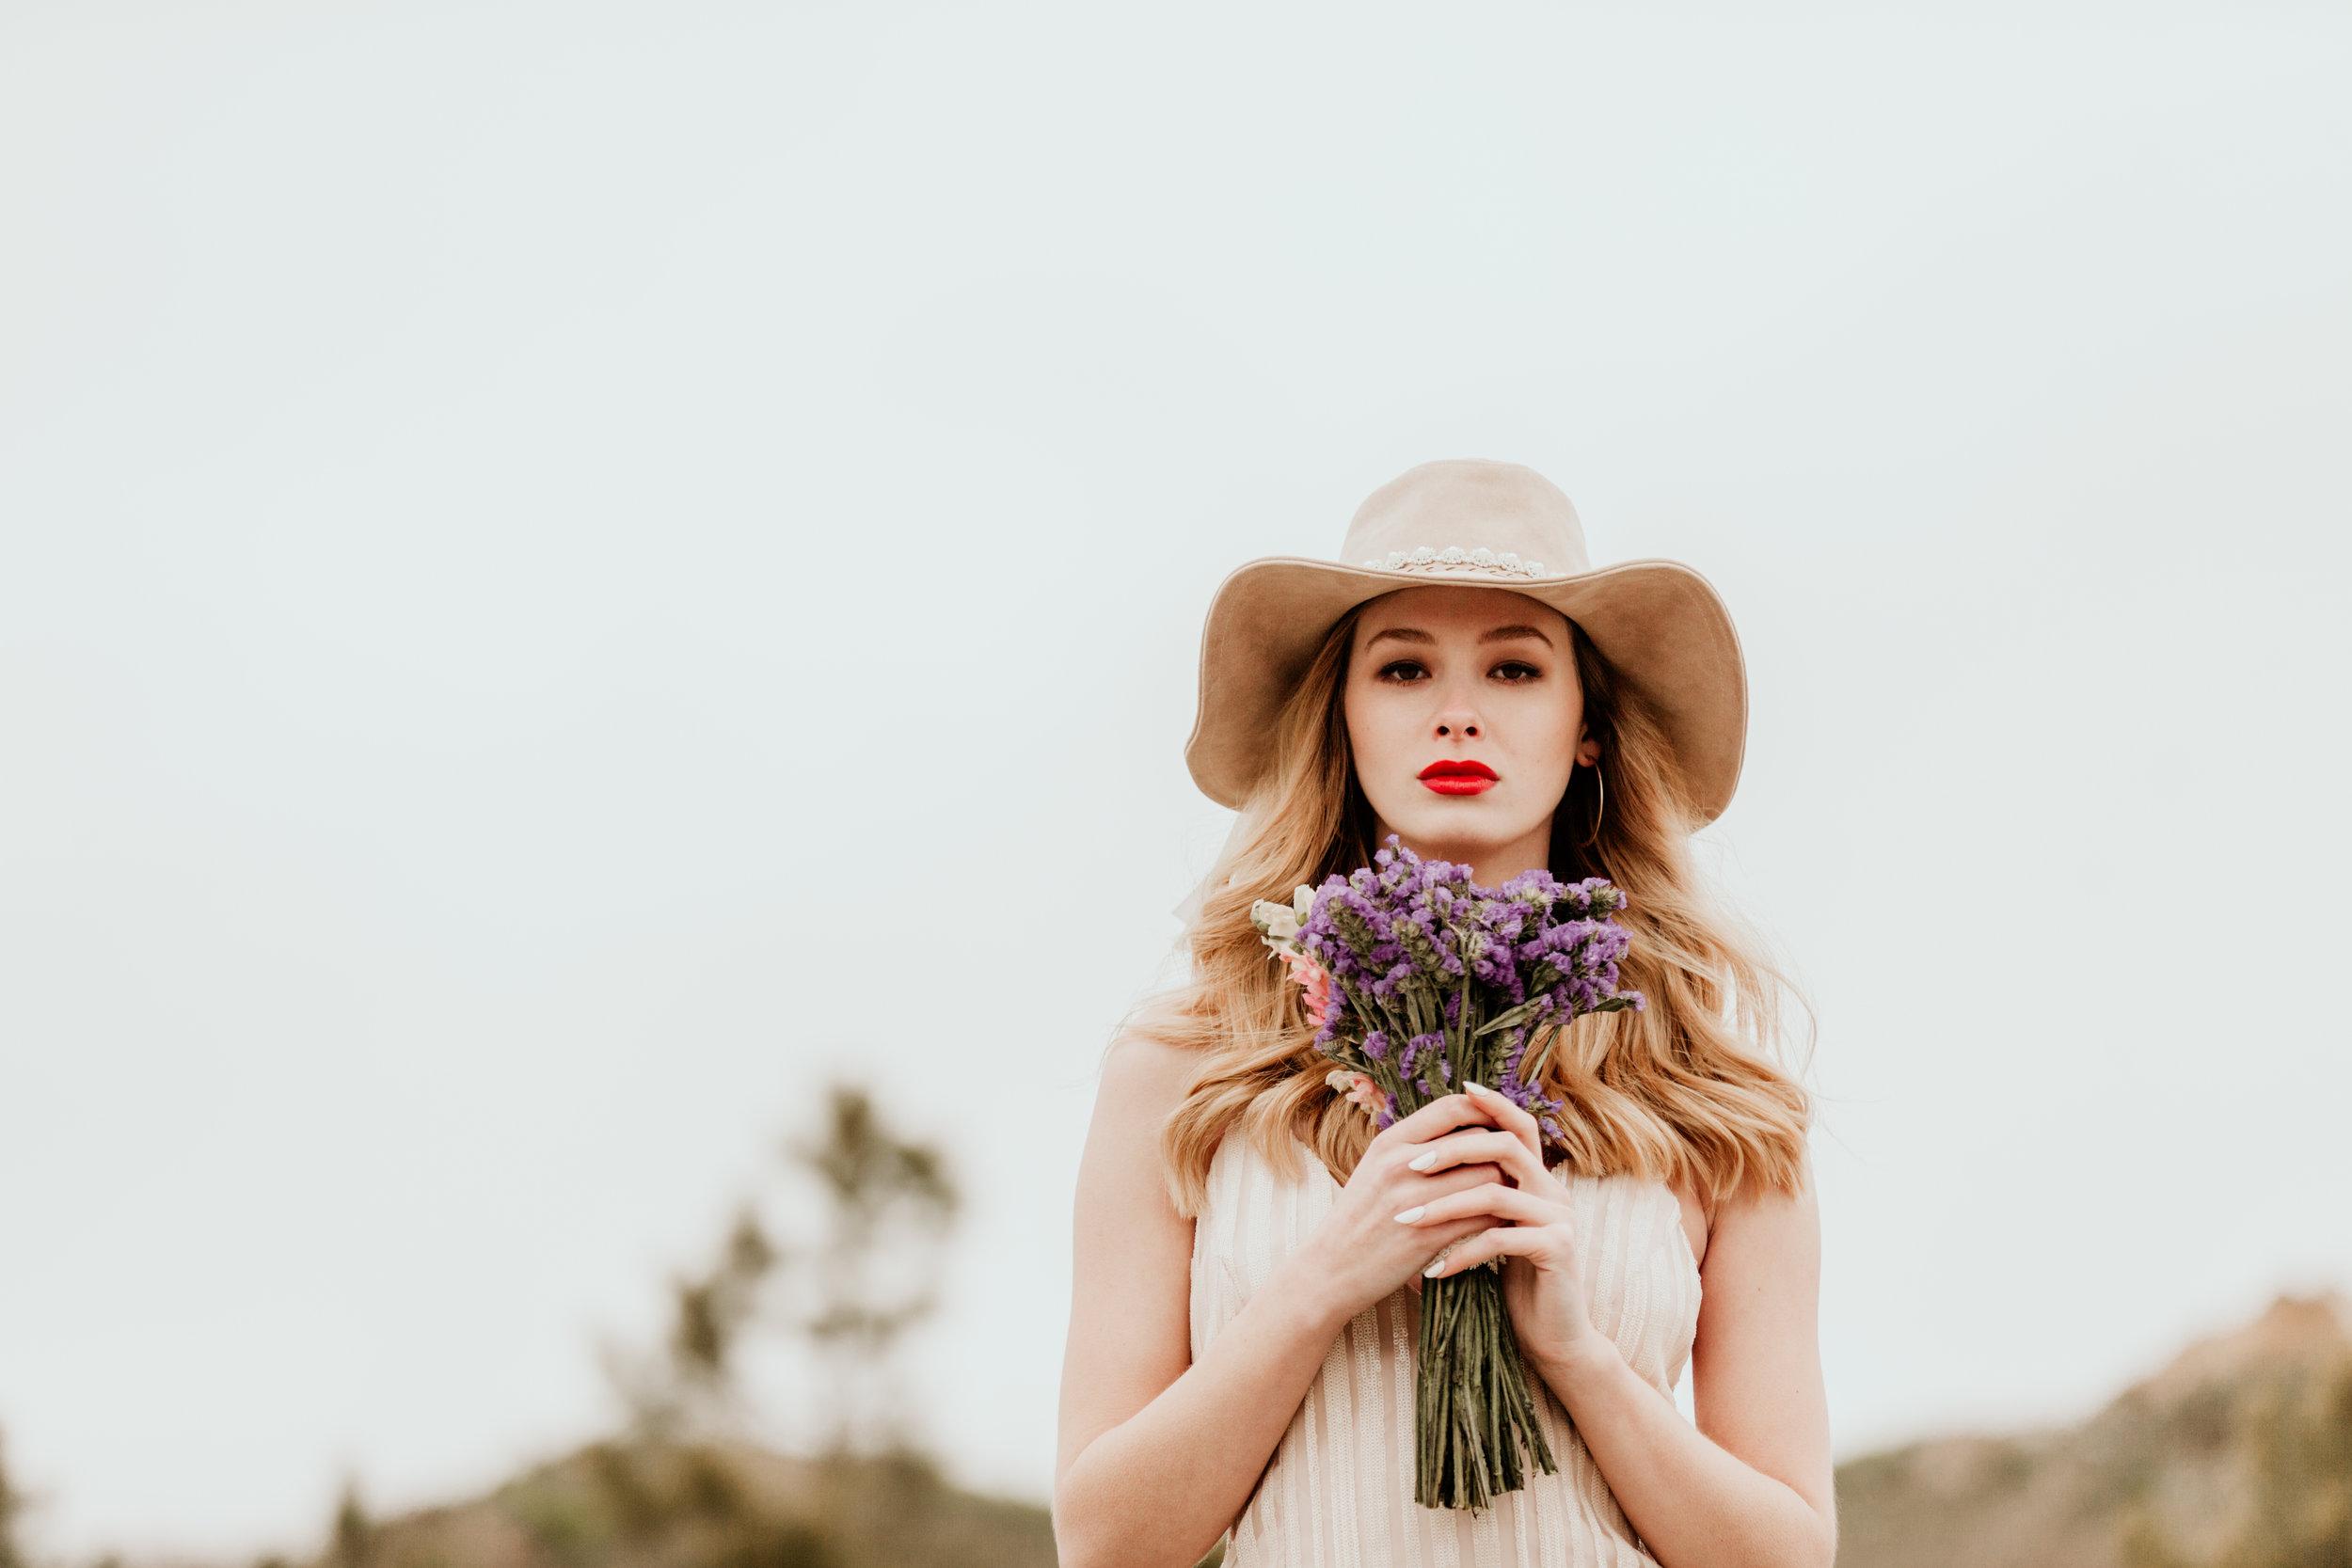 arkansas-bridal-photographer-little-rock-photography-outdoor-wedding-boho-fashion-engagement-elopement-bouquet-bride